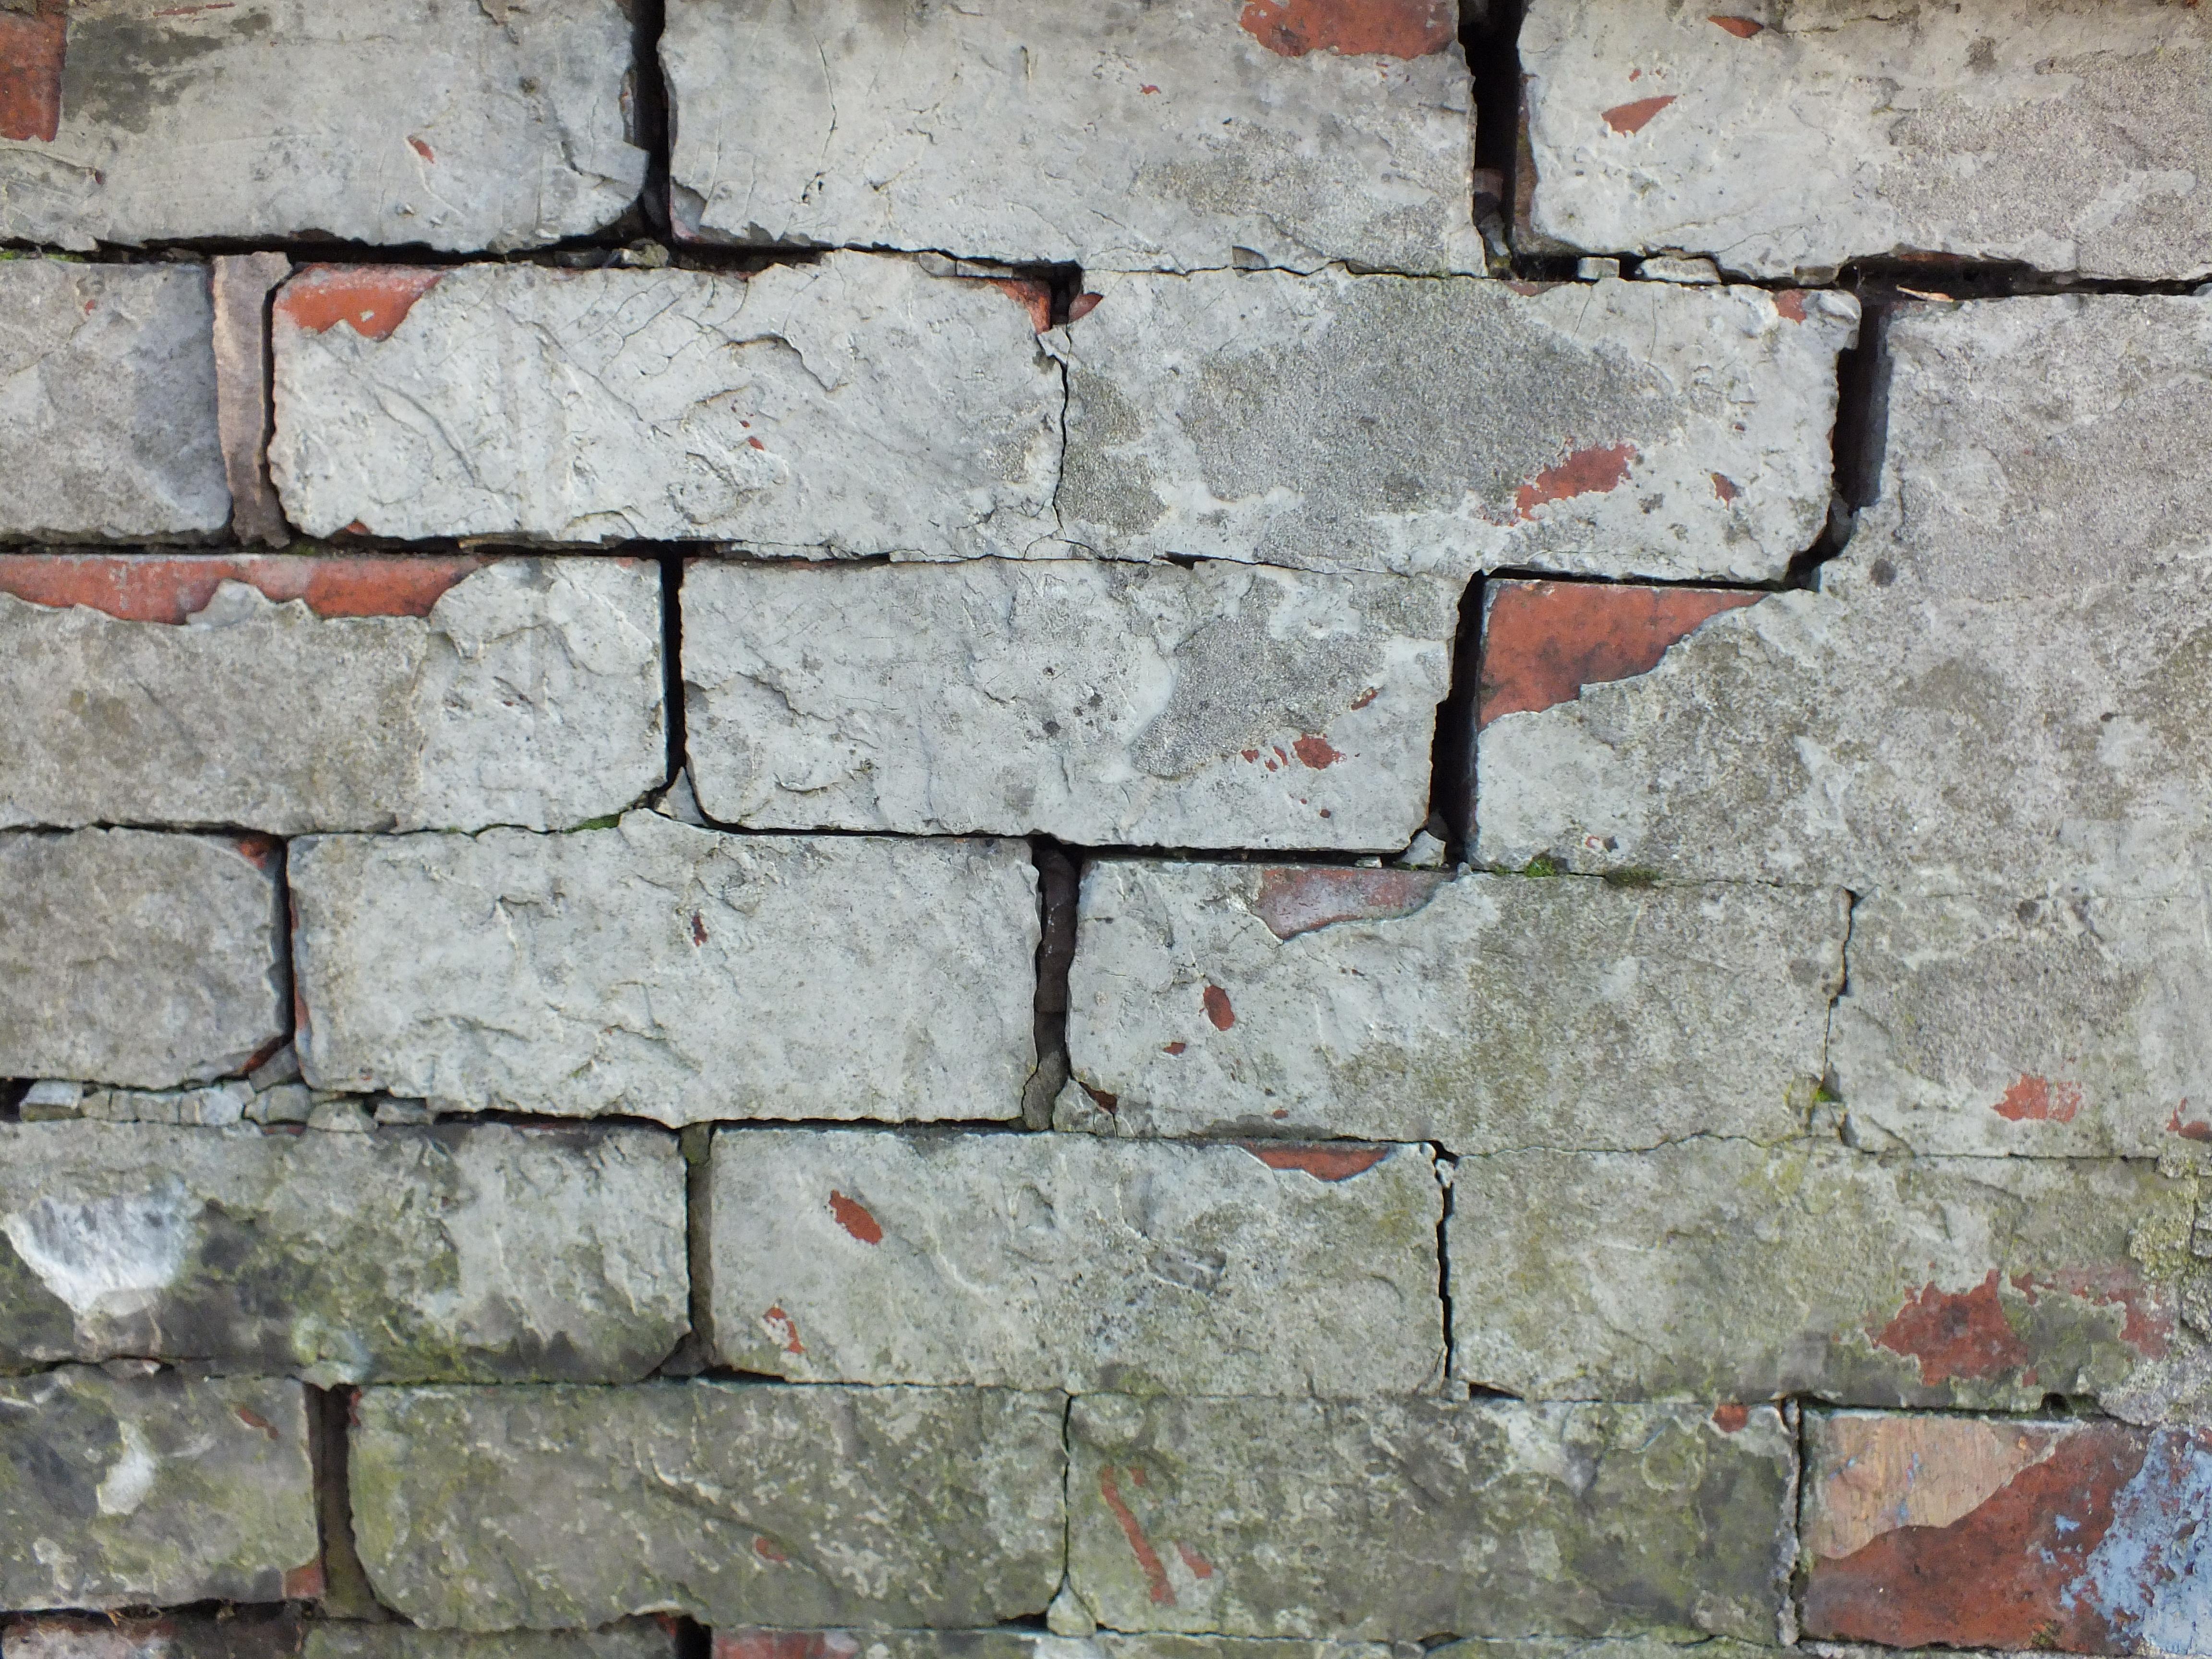 Bricks, Concrete, Grunge, Stone, Texture, HQ Photo